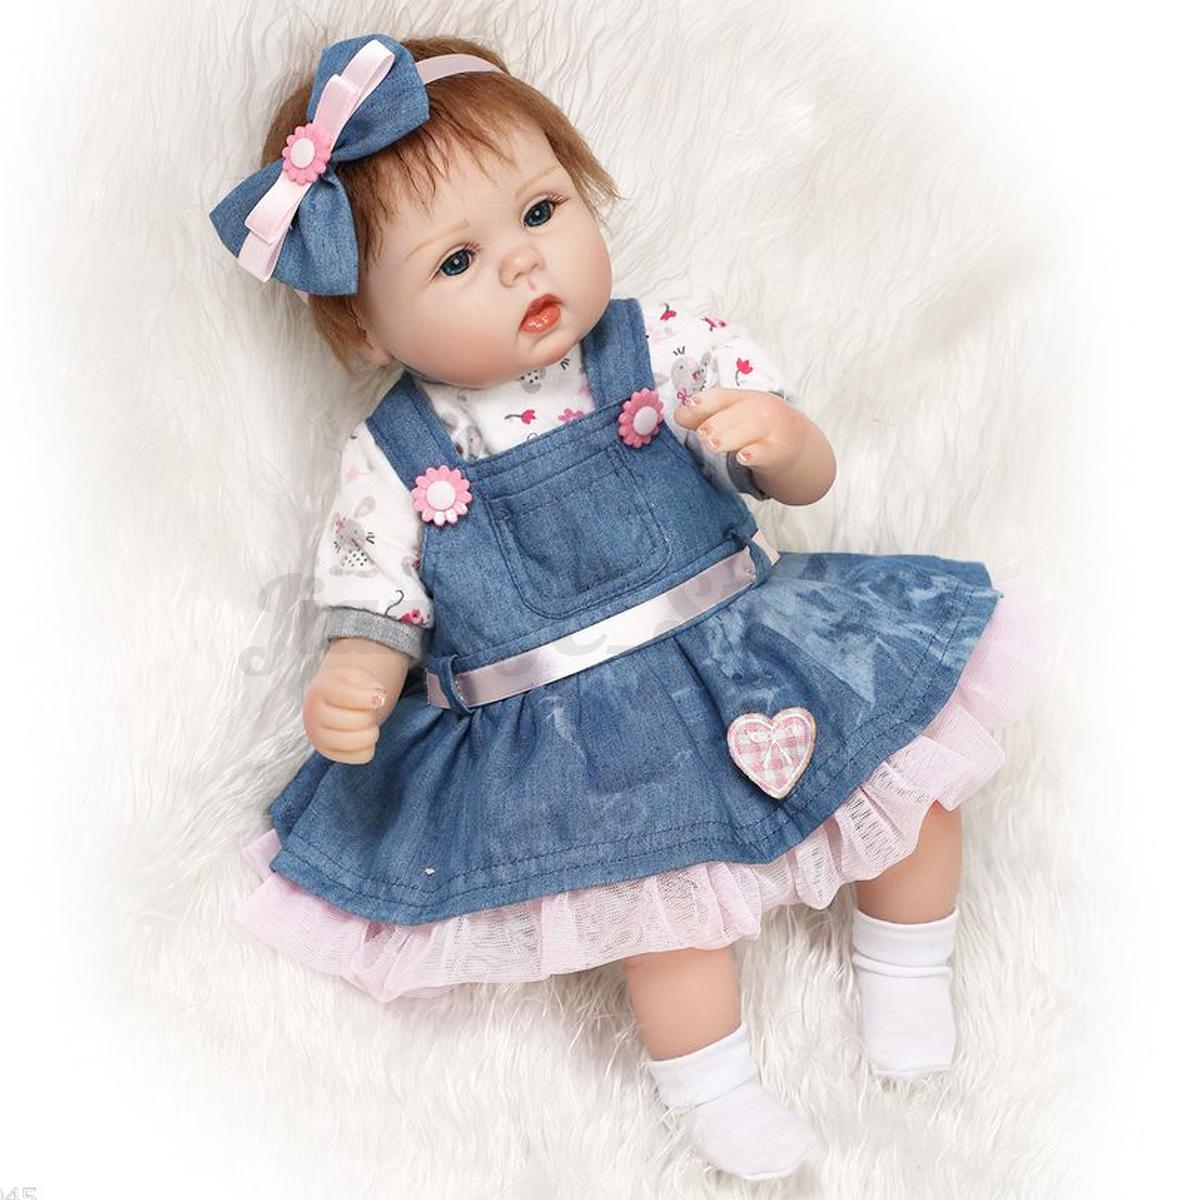 30 Types Lifelike Baby Doll Handmade Silicone Vinyl Reborn